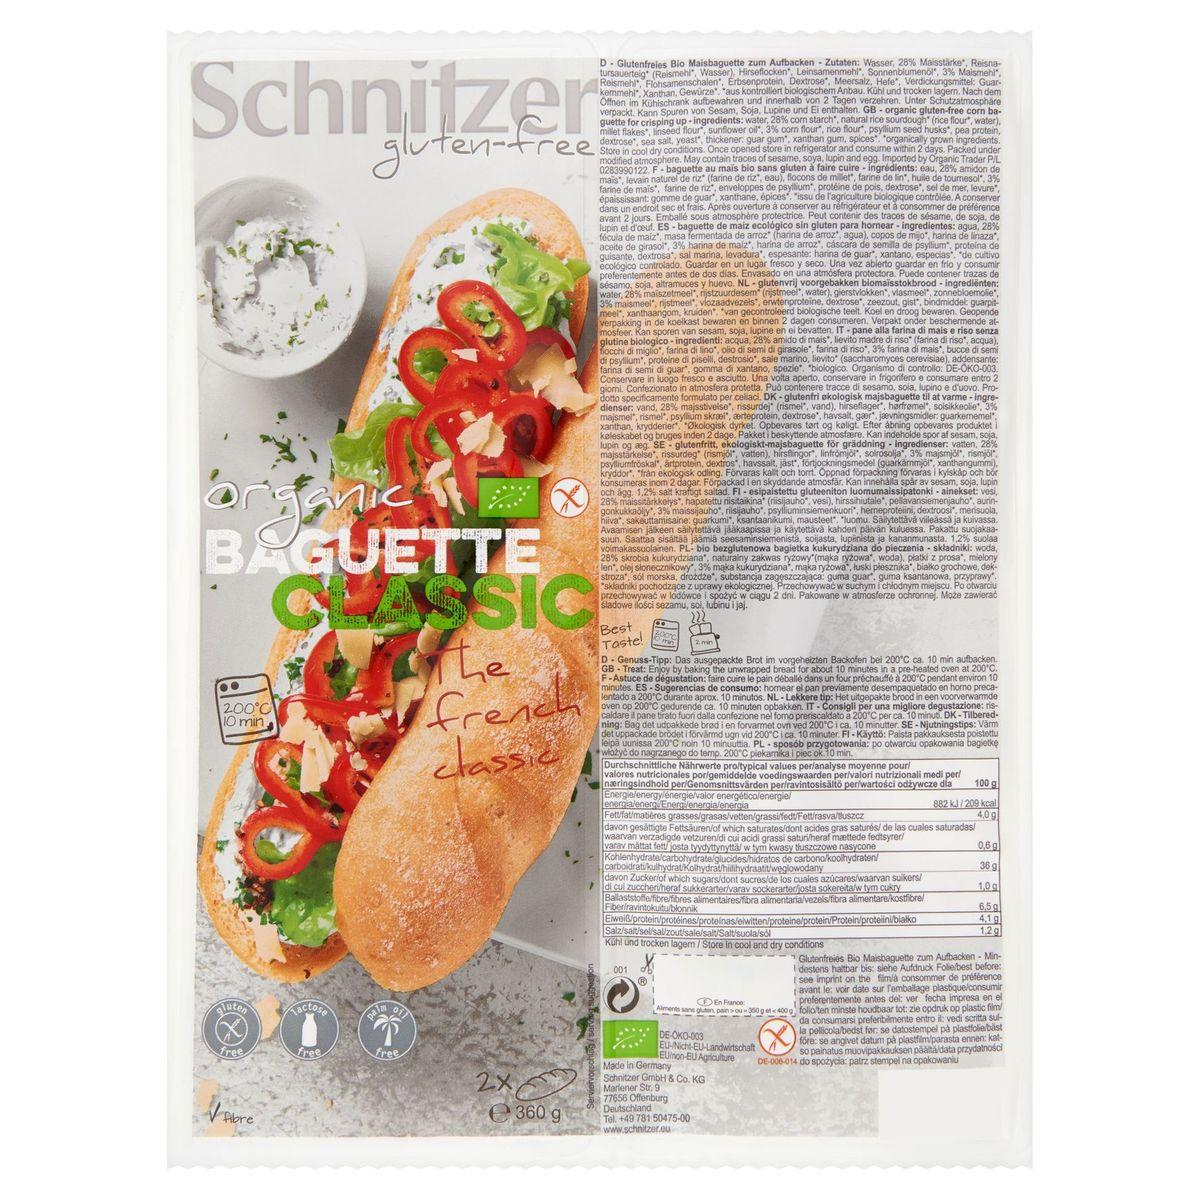 Schnitzer Gluten-Free Organic Baguette Classic 2 Pièces 360 g